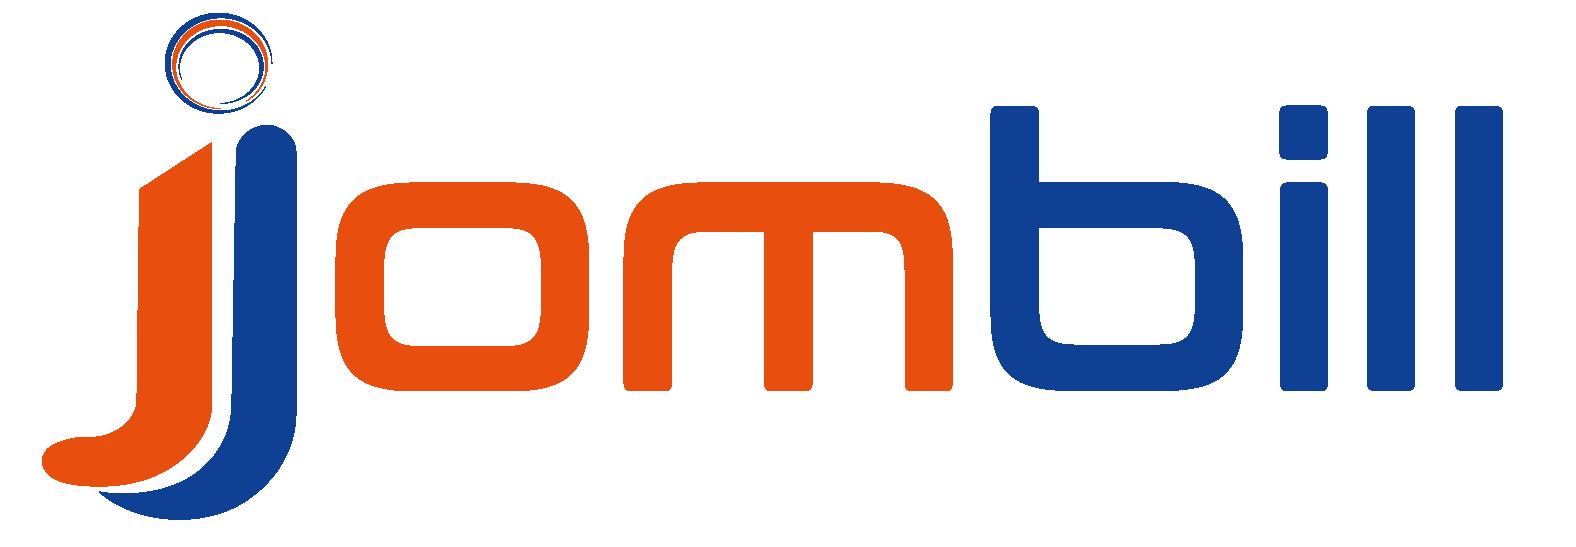 jomosft utility billing system